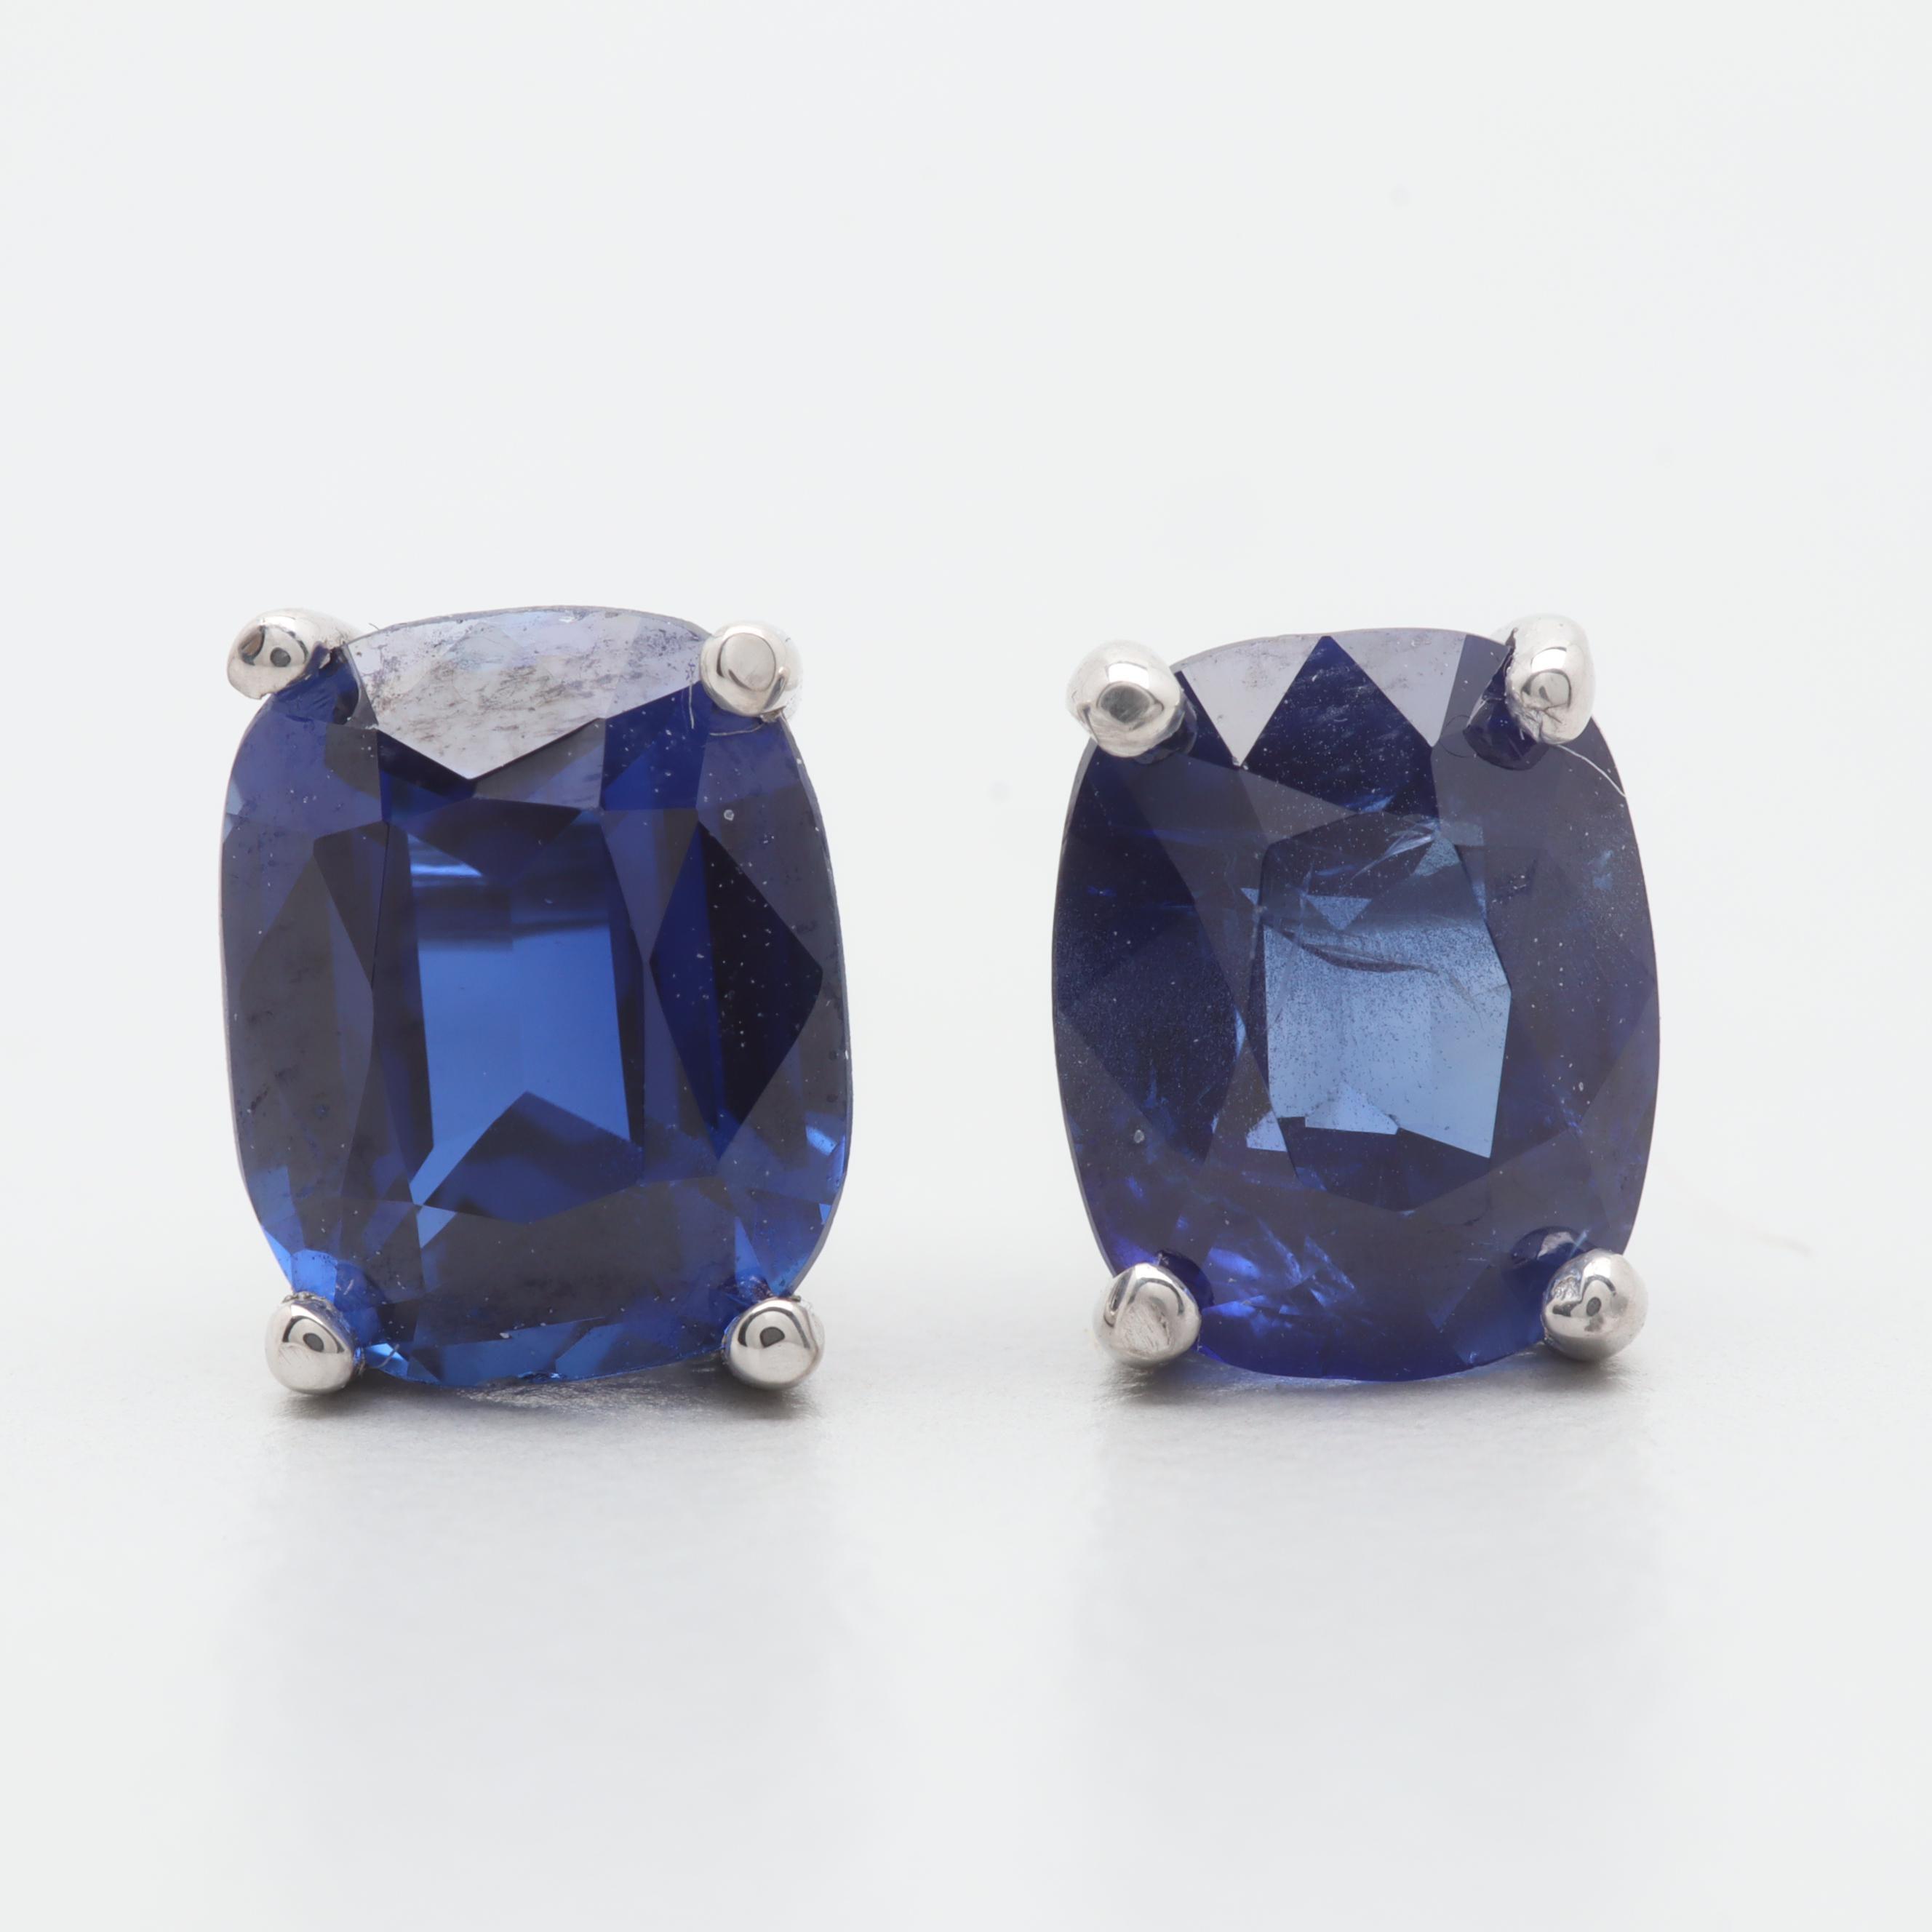 14K White Gold Synthetic Blue Sapphire Stud Earrings